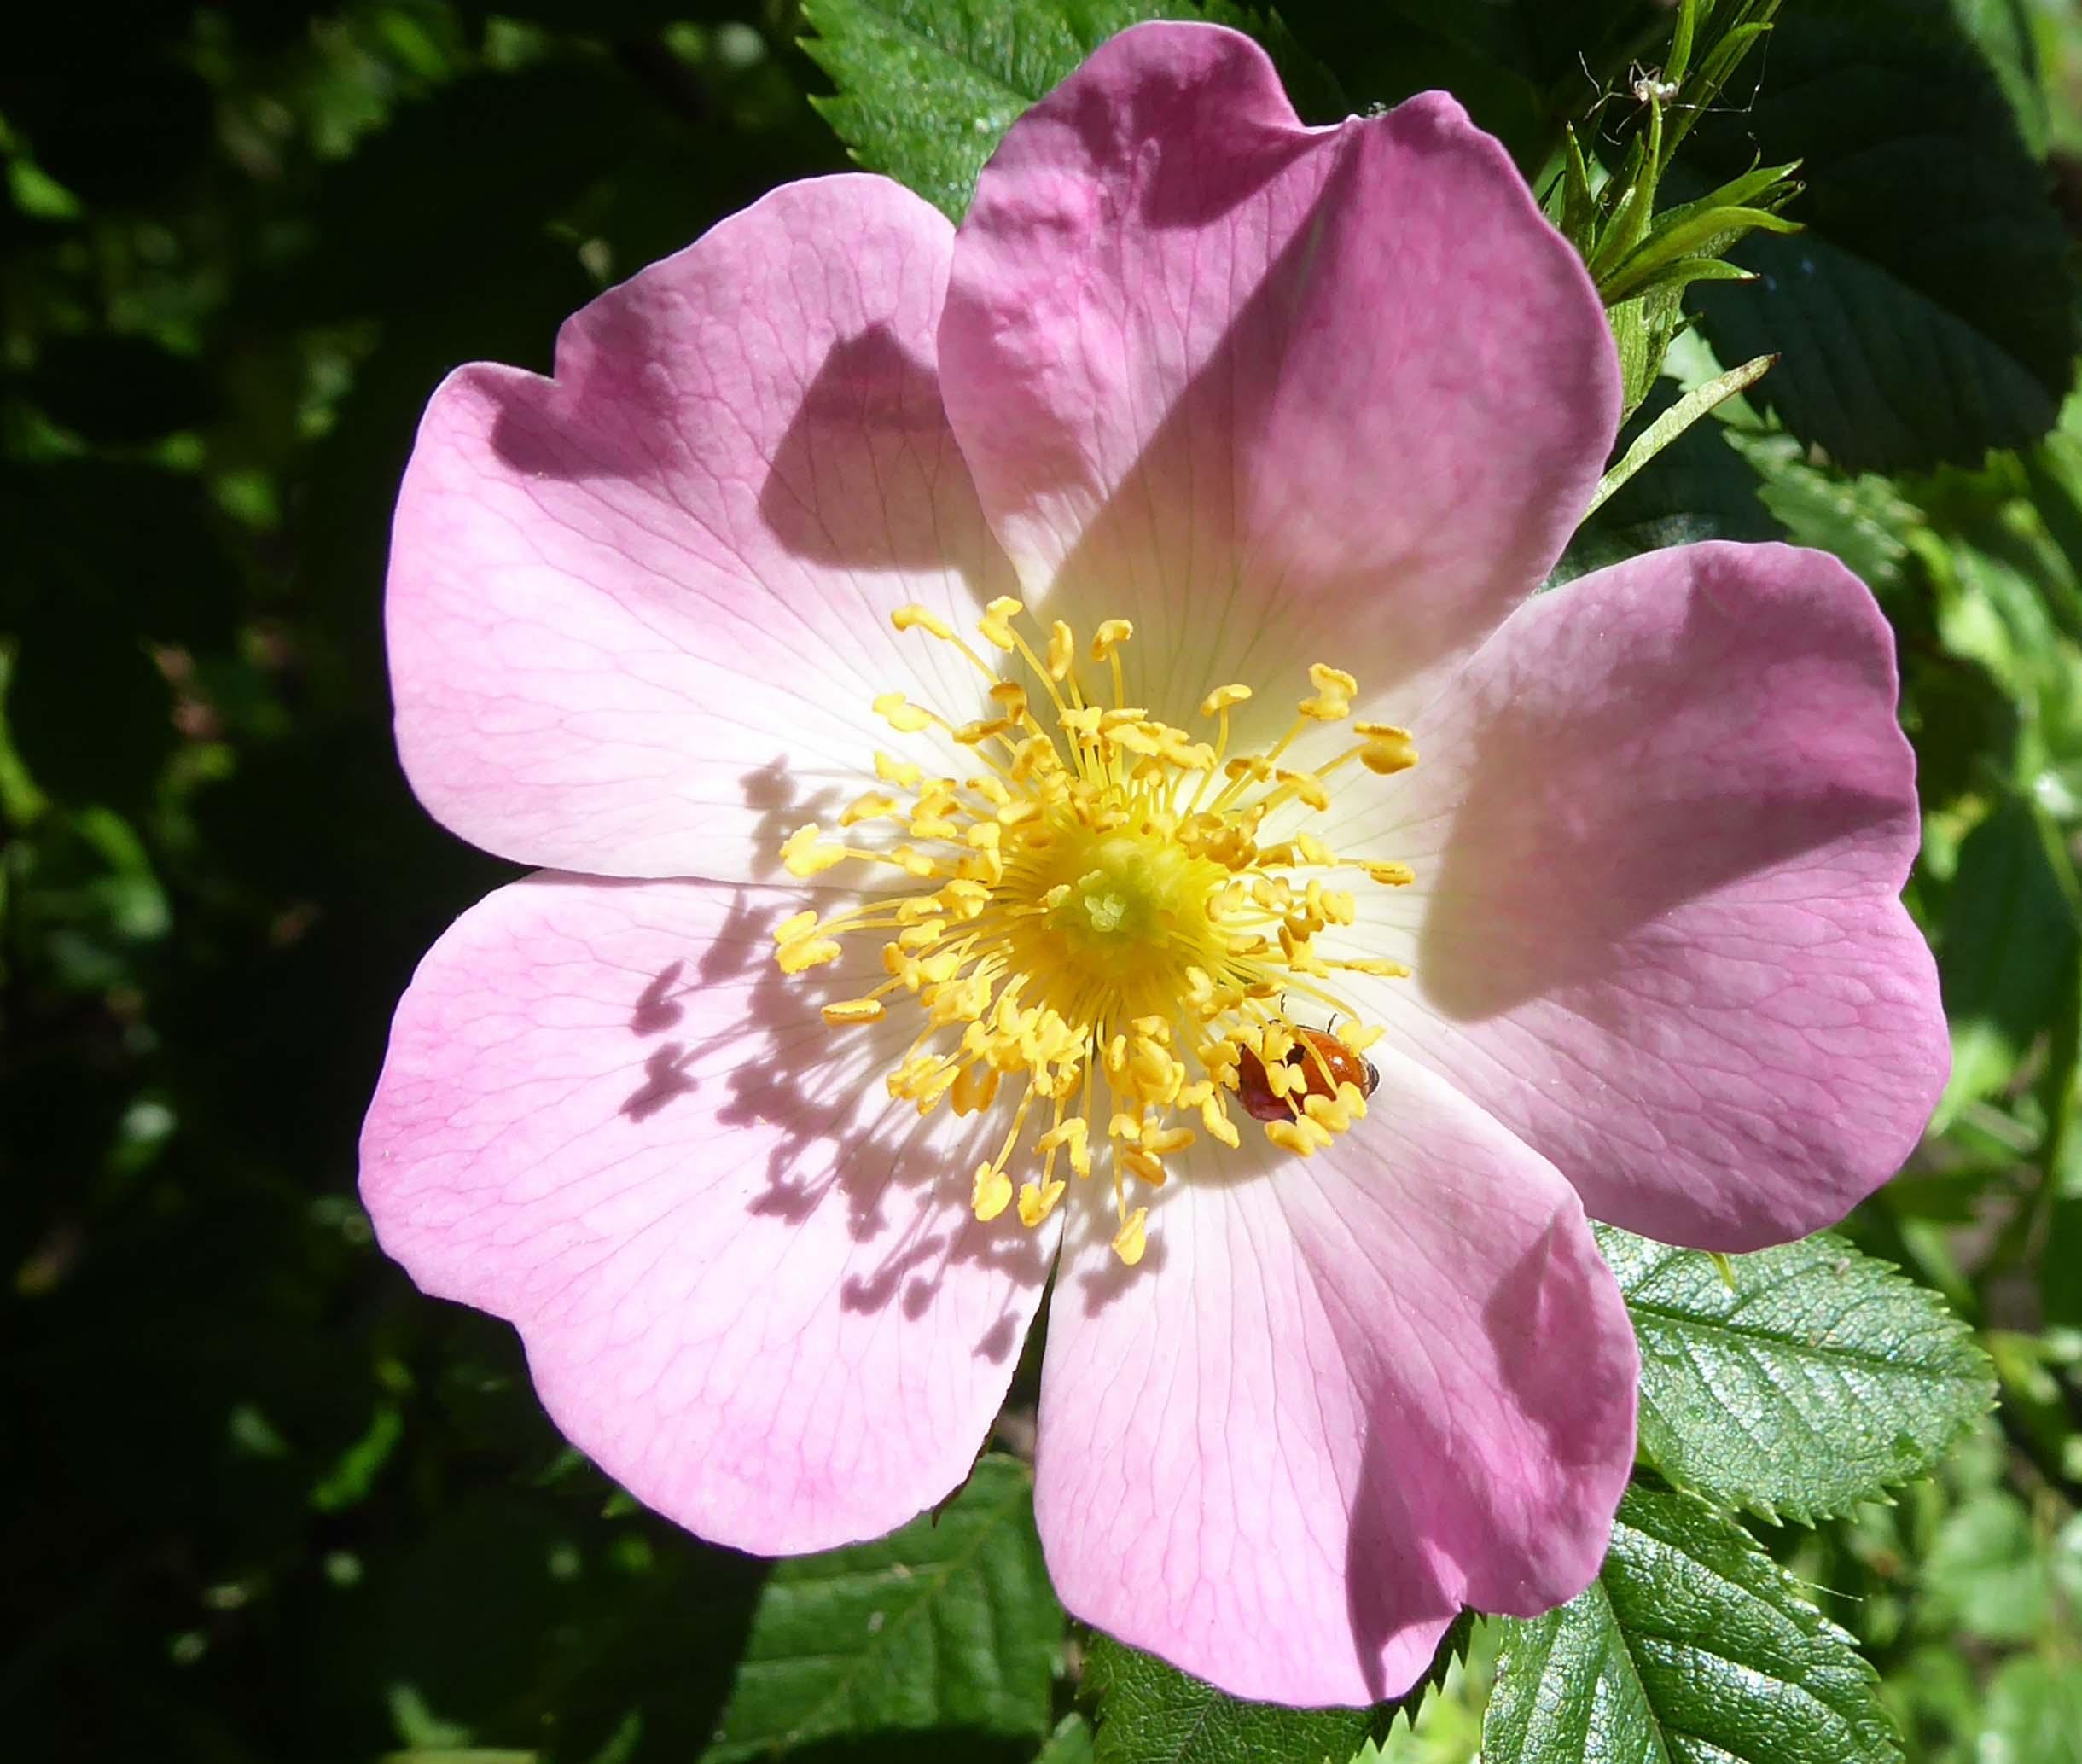 Ladybird on a pink rose